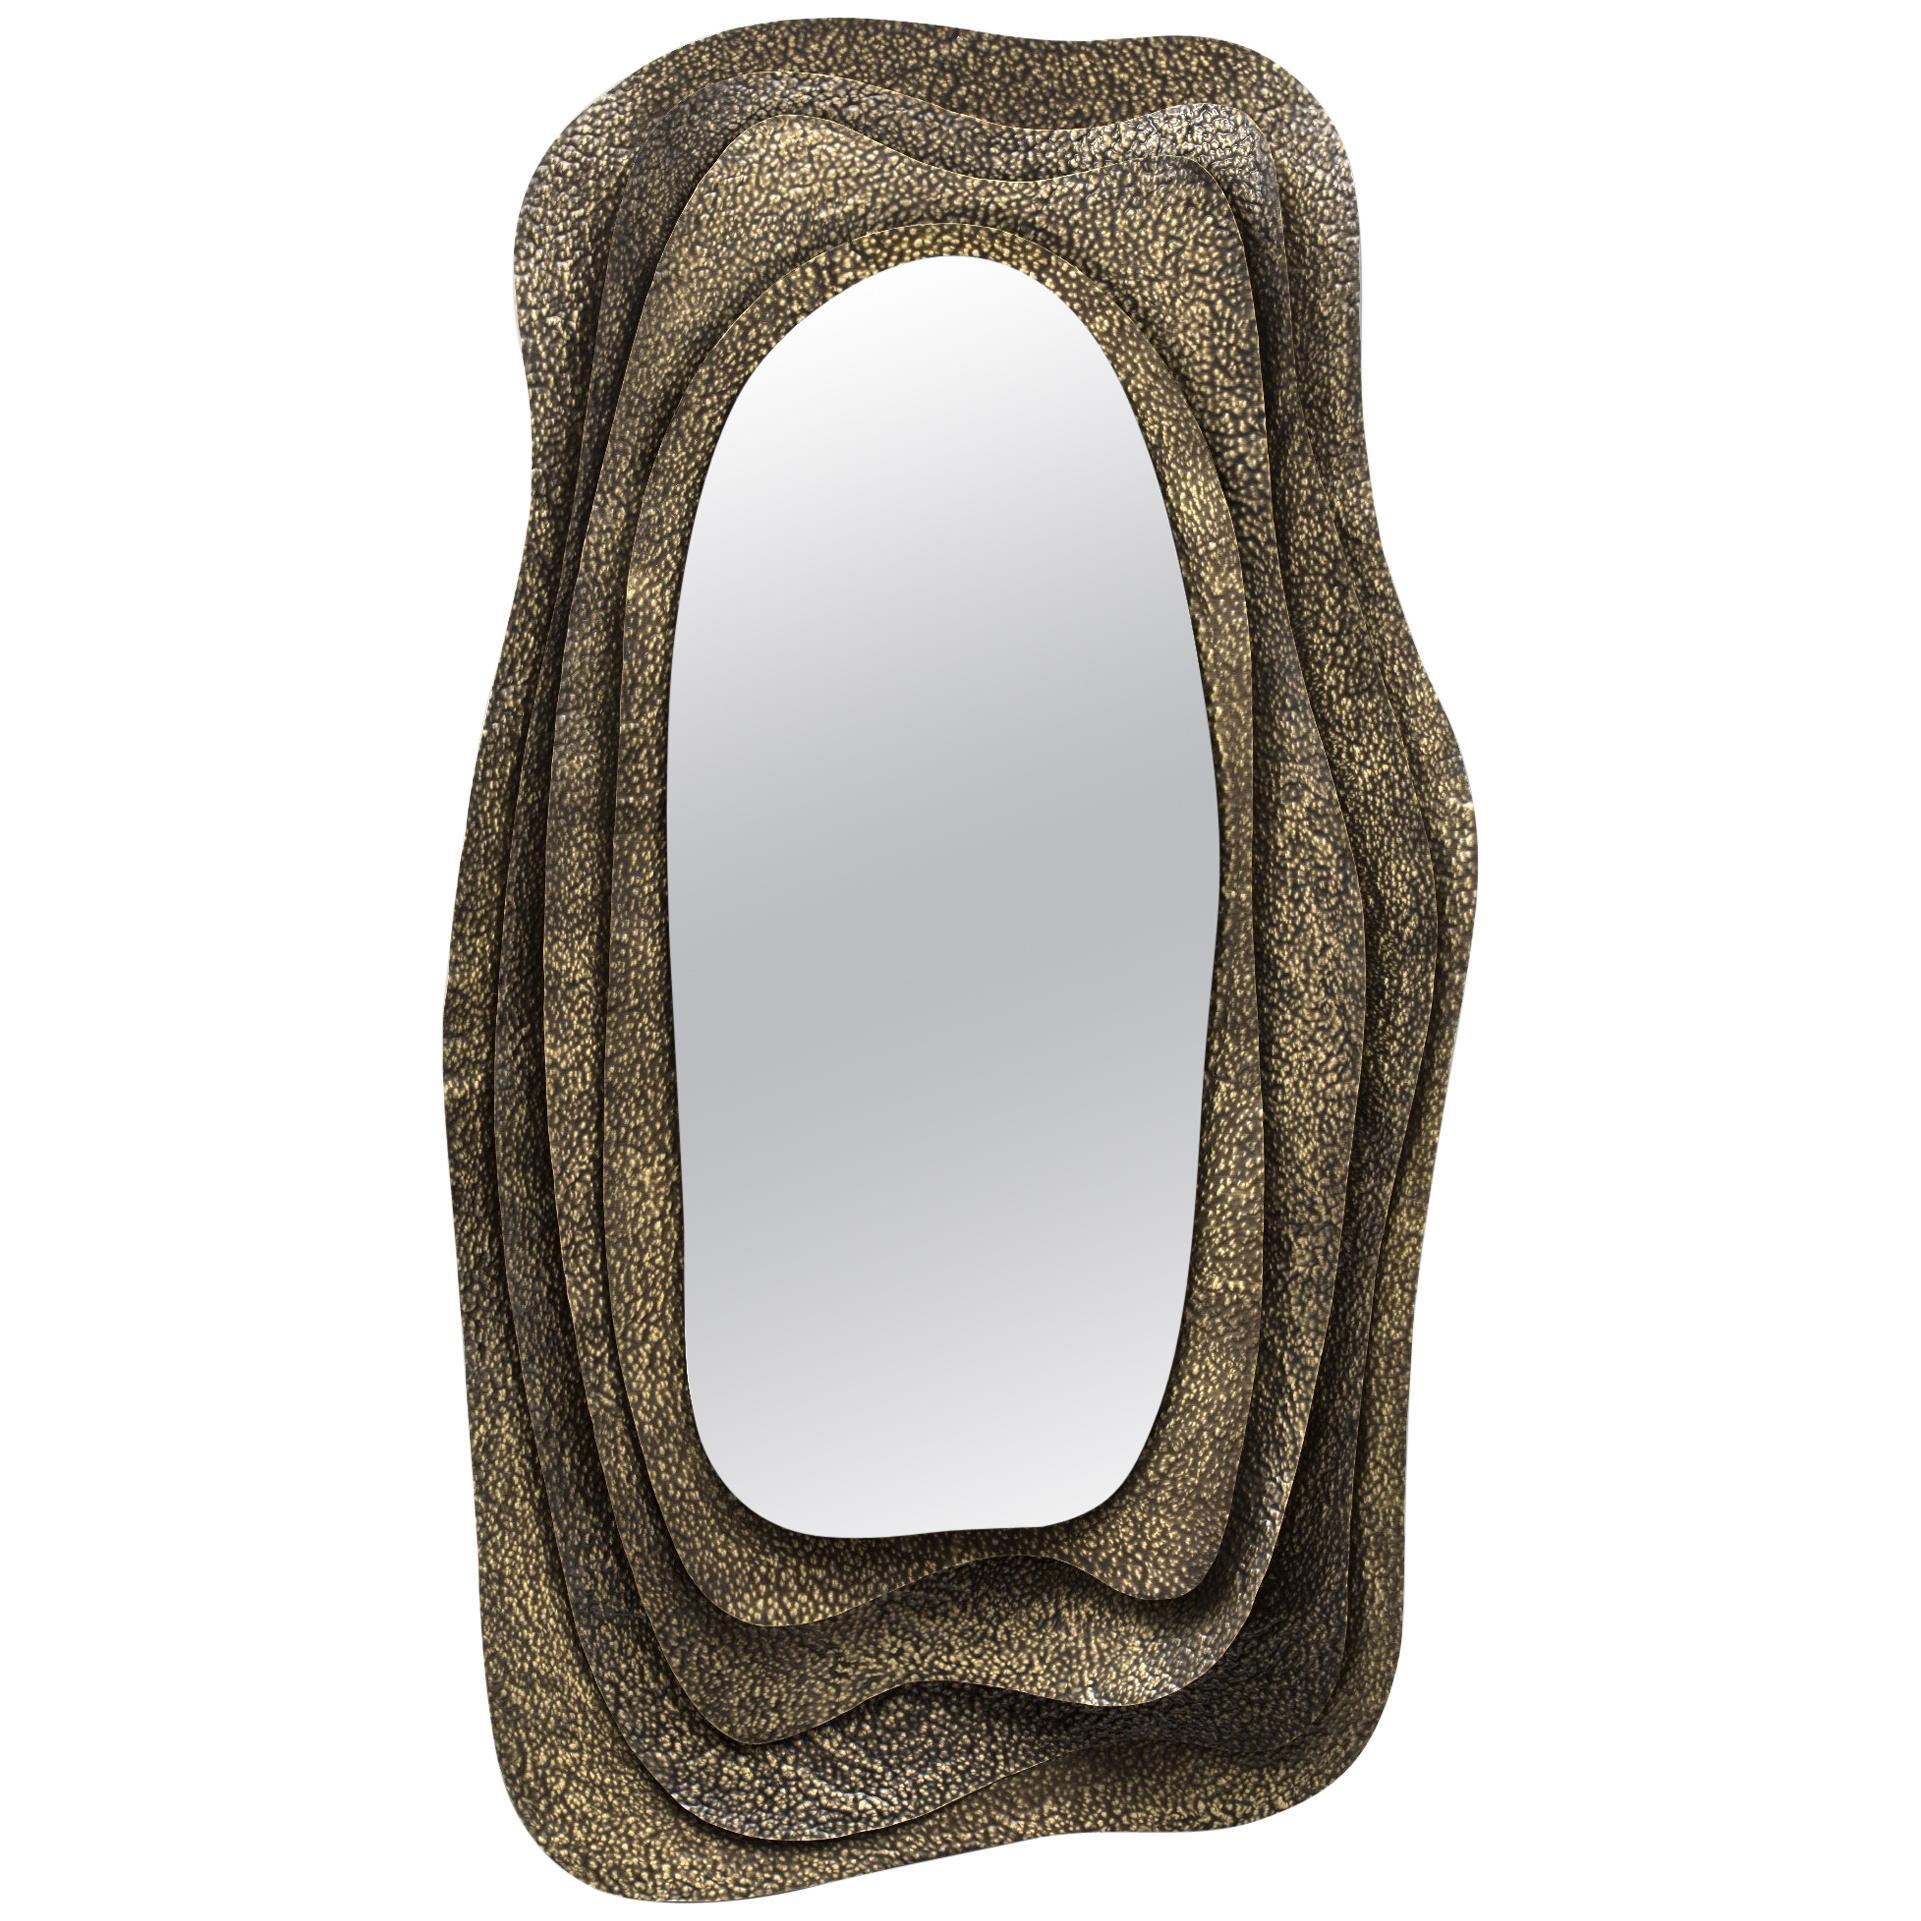 Kumi I Rectangular Mirror in Hammered Aged Brass